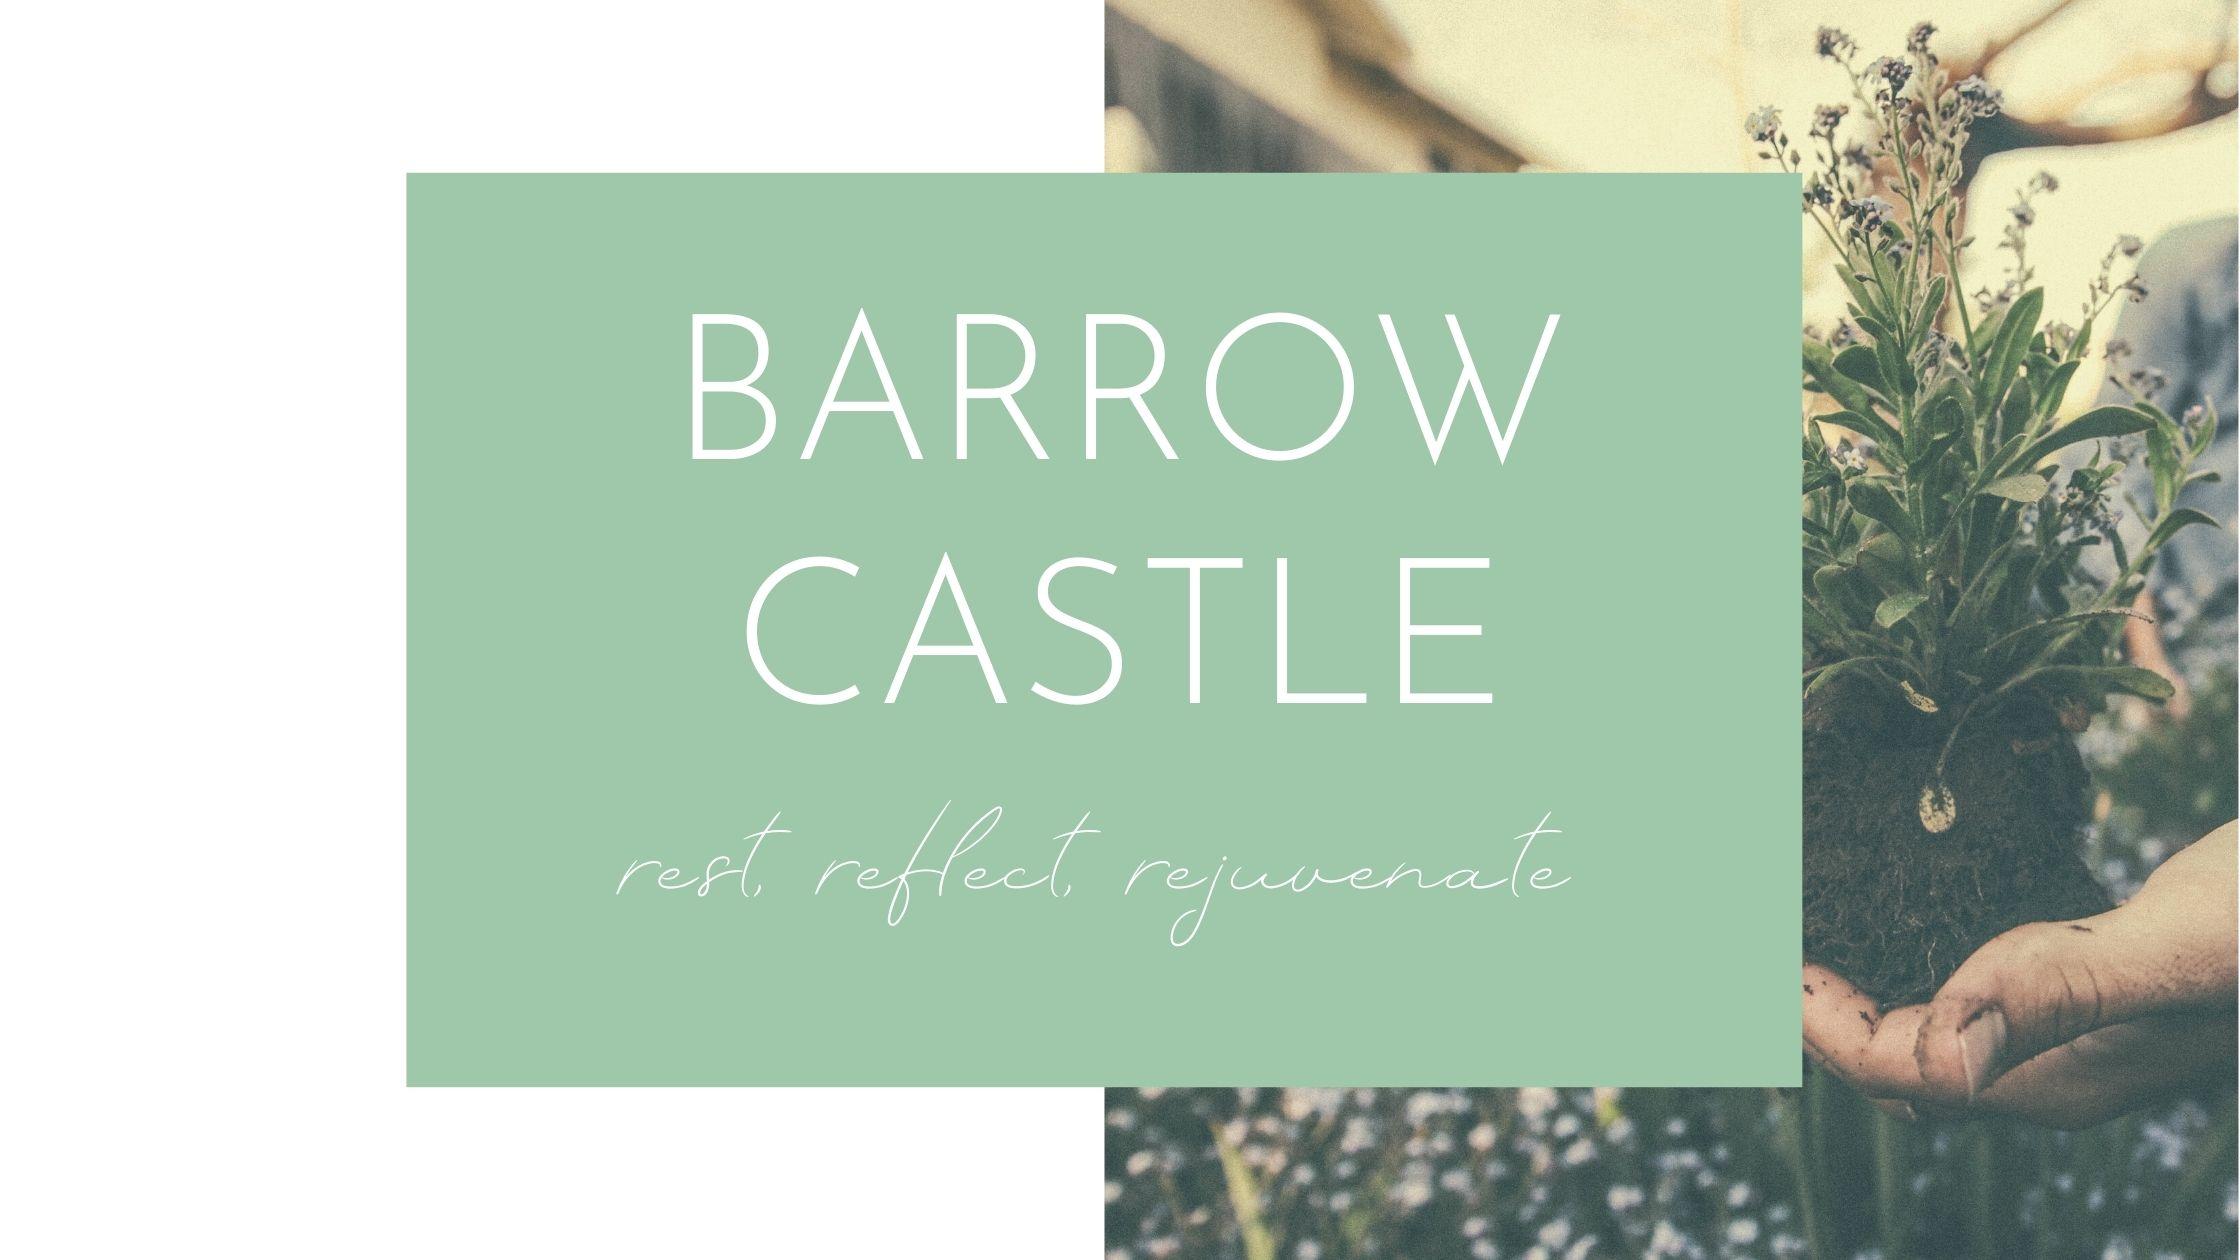 Barrow Castle